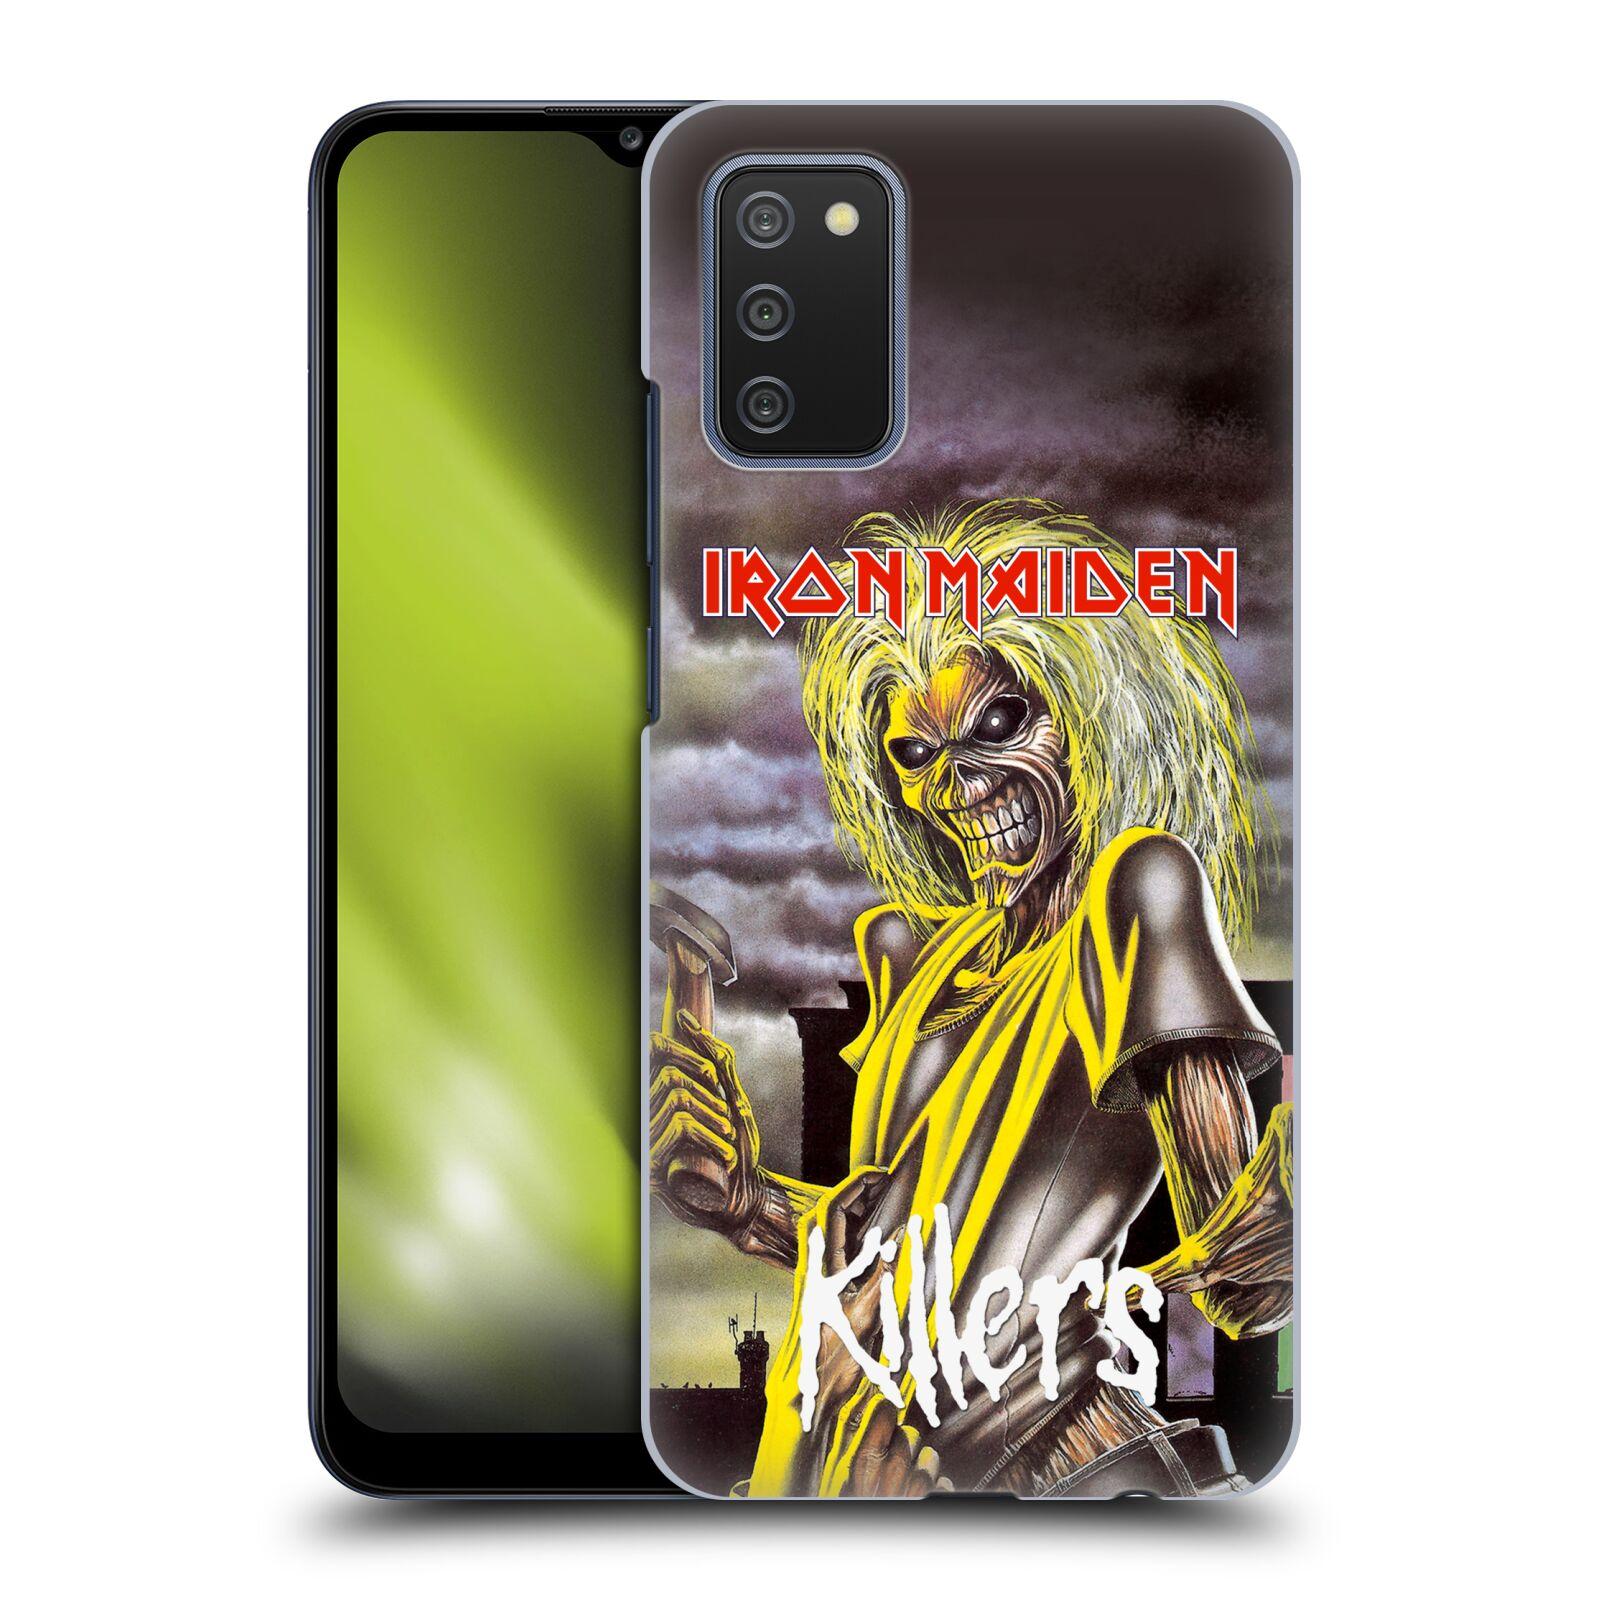 Plastové pouzdro na mobil Samsung Galaxy A02s - Head Case - Iron Maiden - Killers